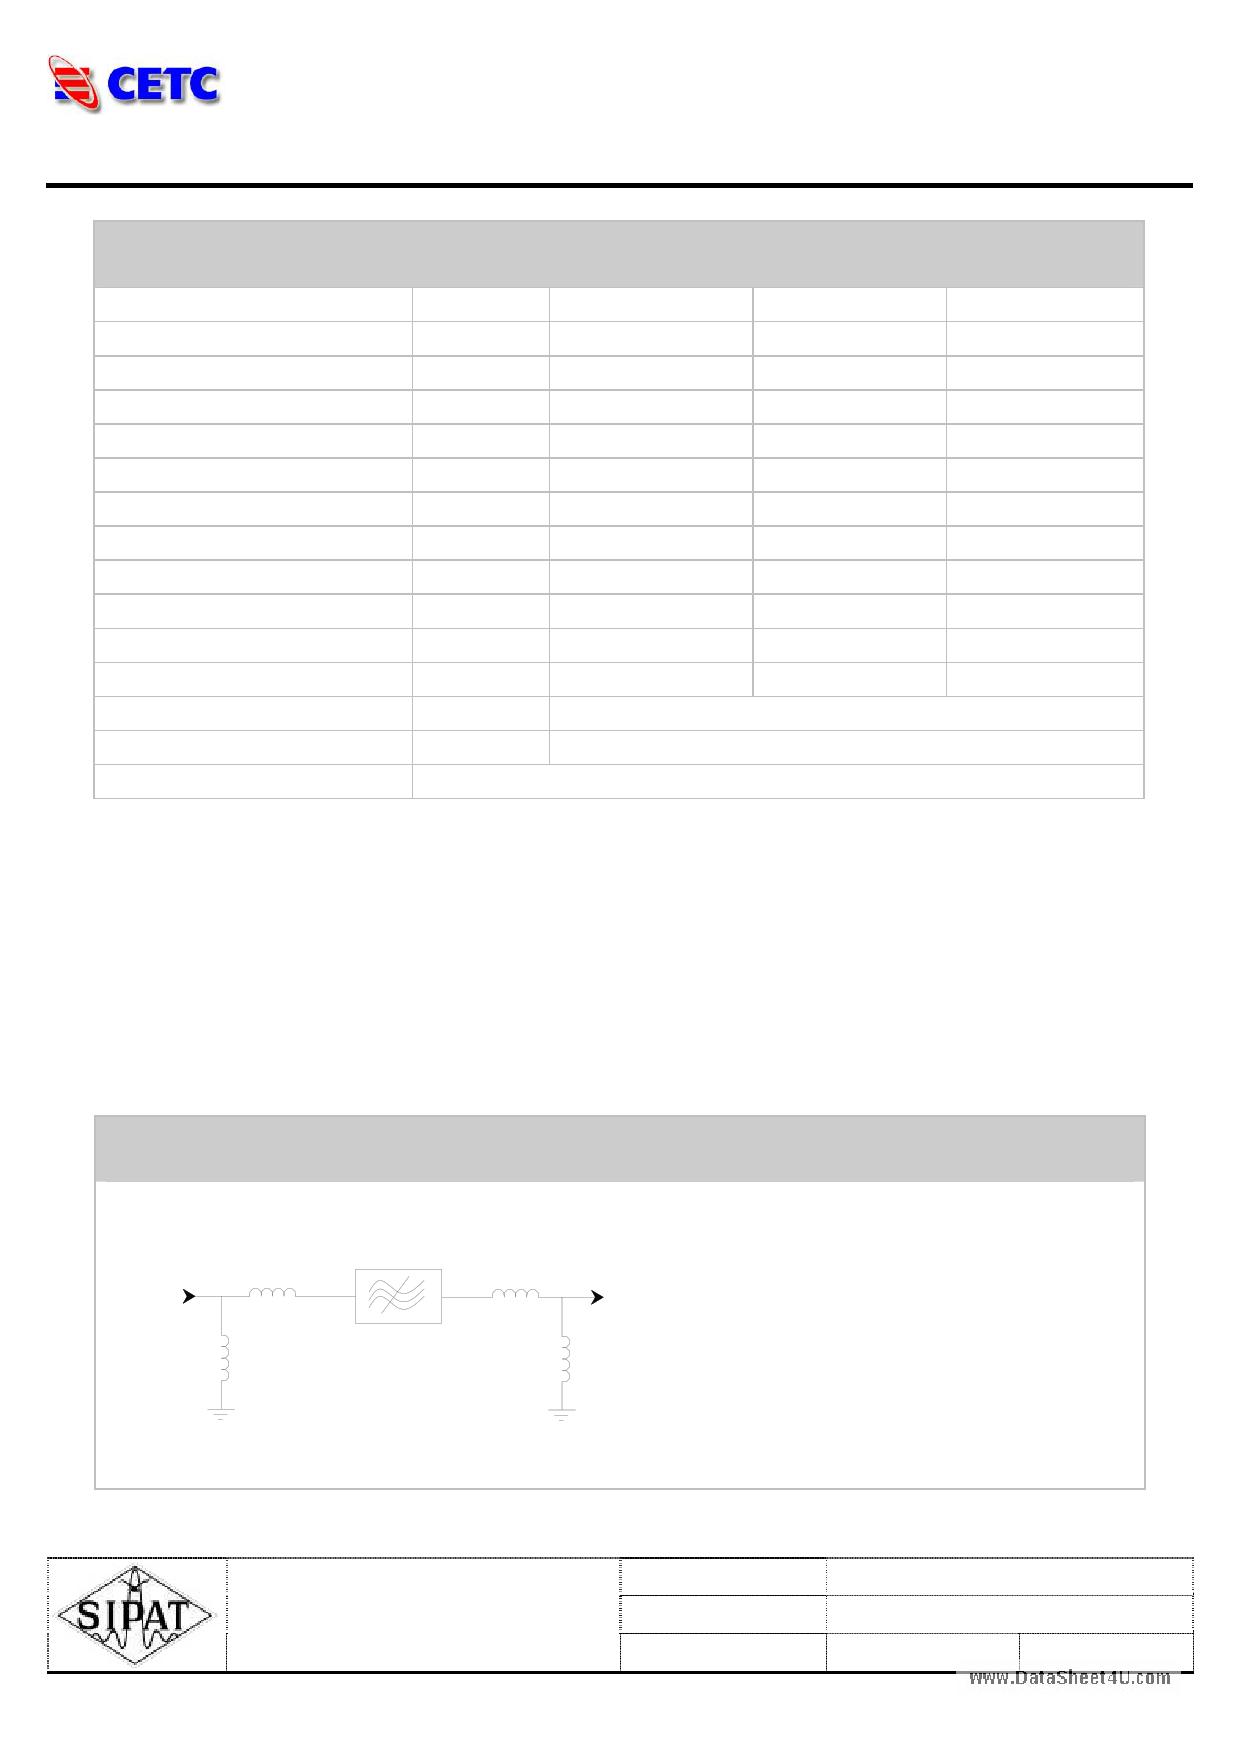 LBN08017 datasheet